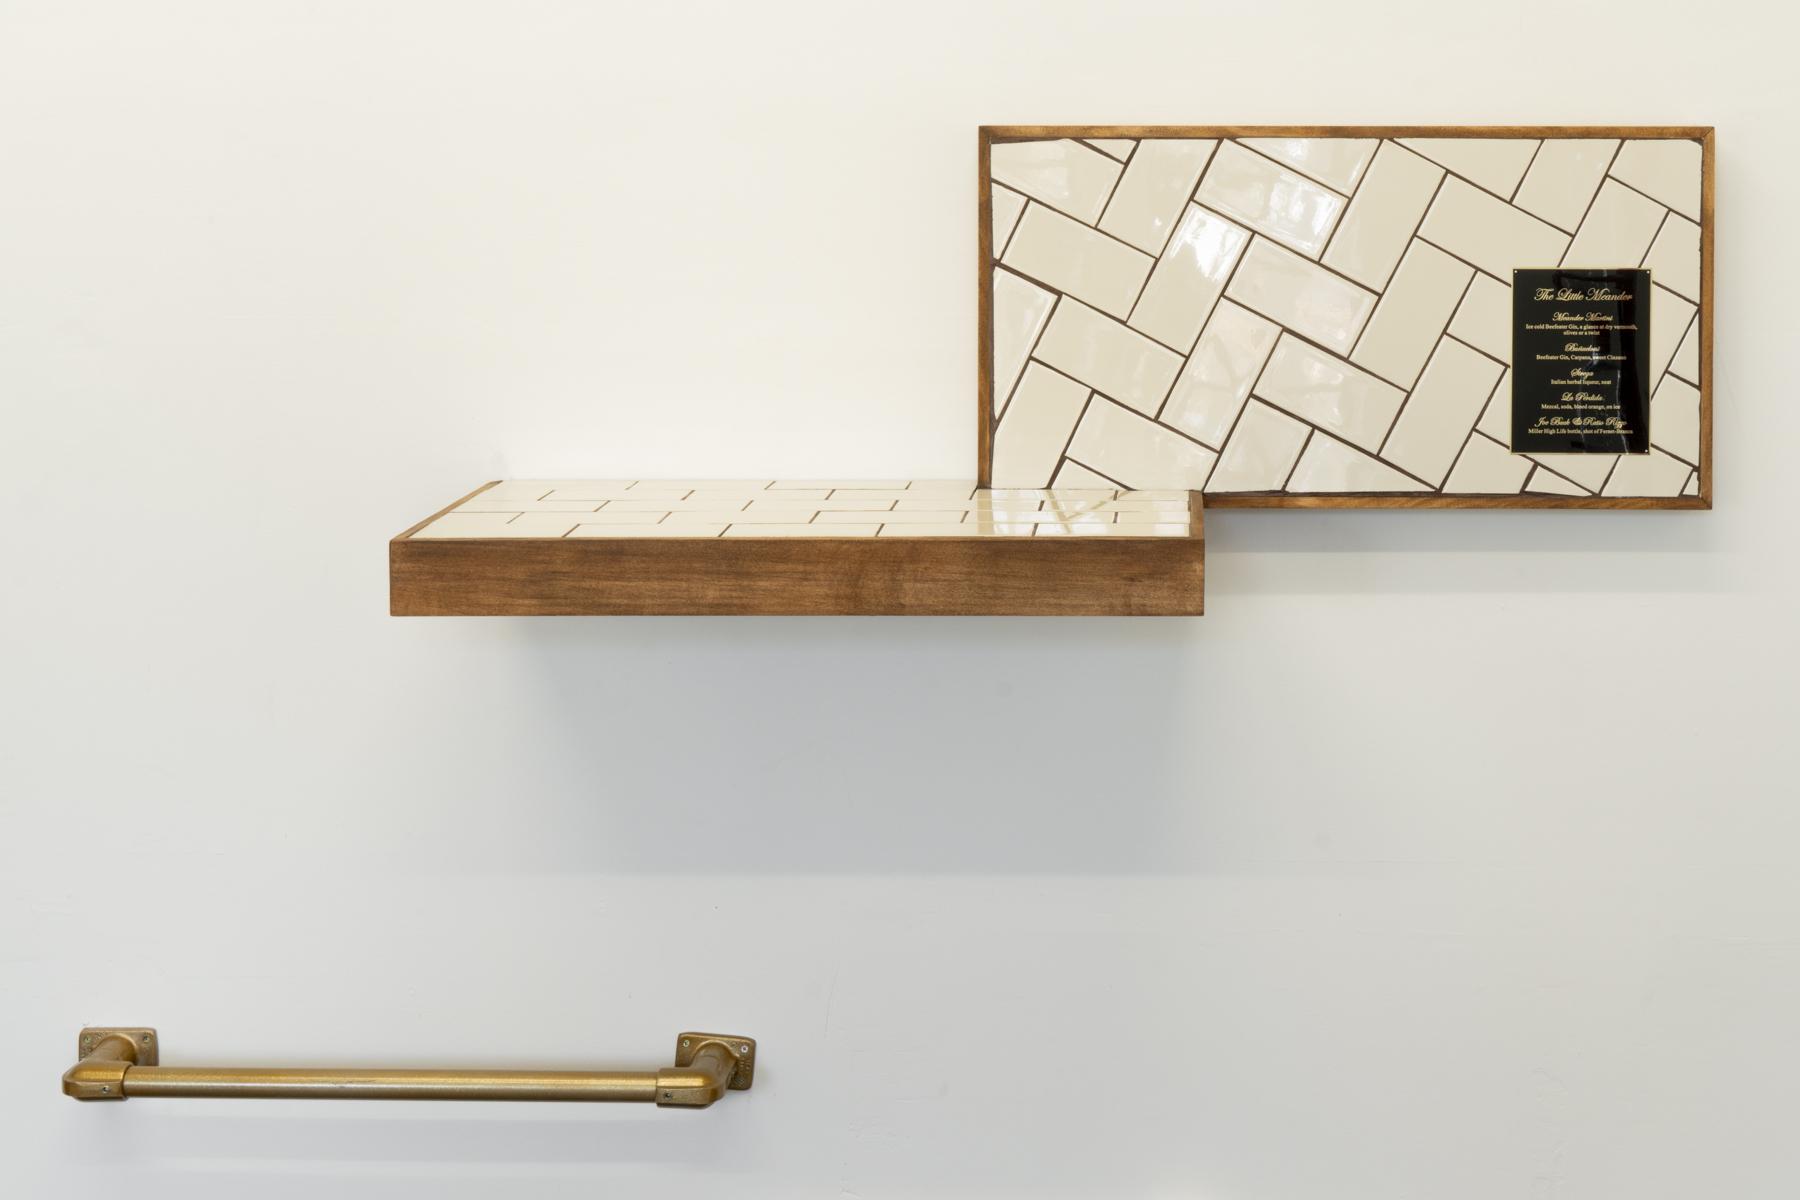 Bar Shelf (a la carte), 2019